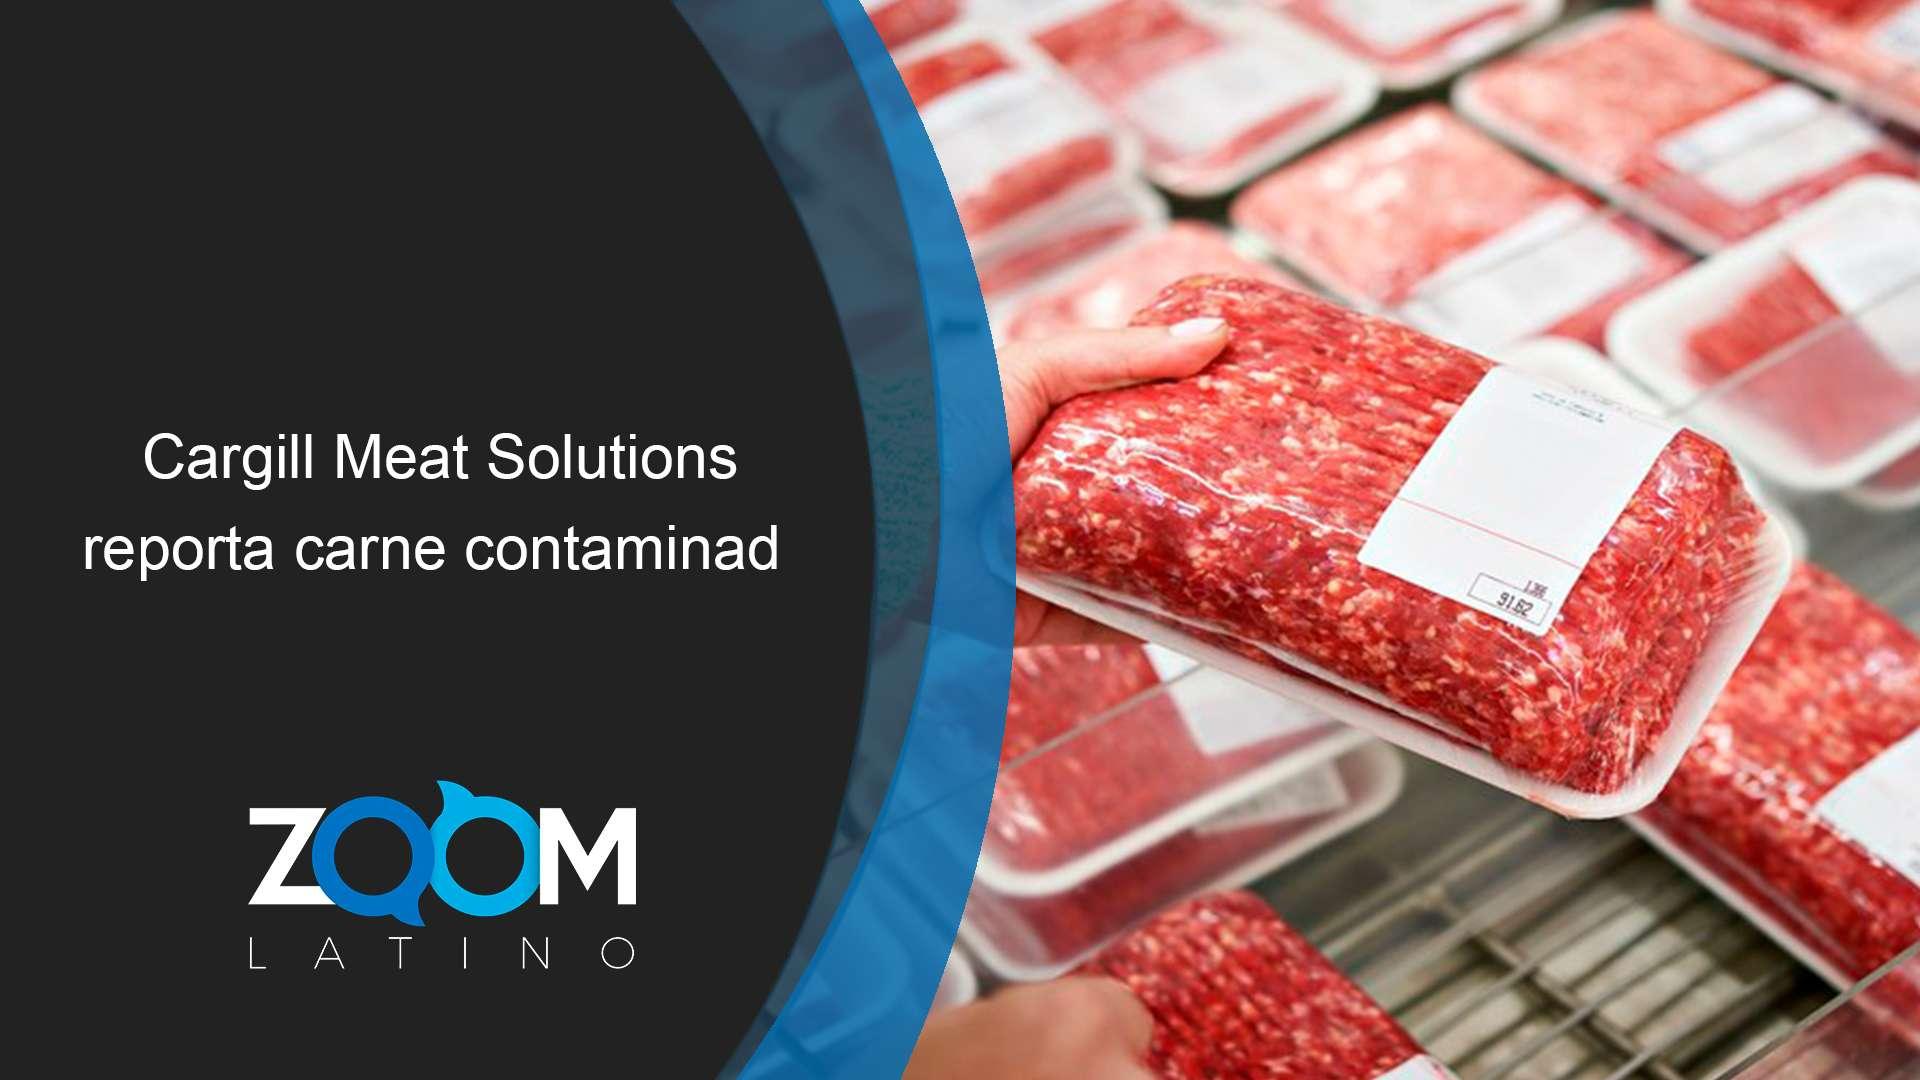 Se retiran 132,606 libras de carne contaminada